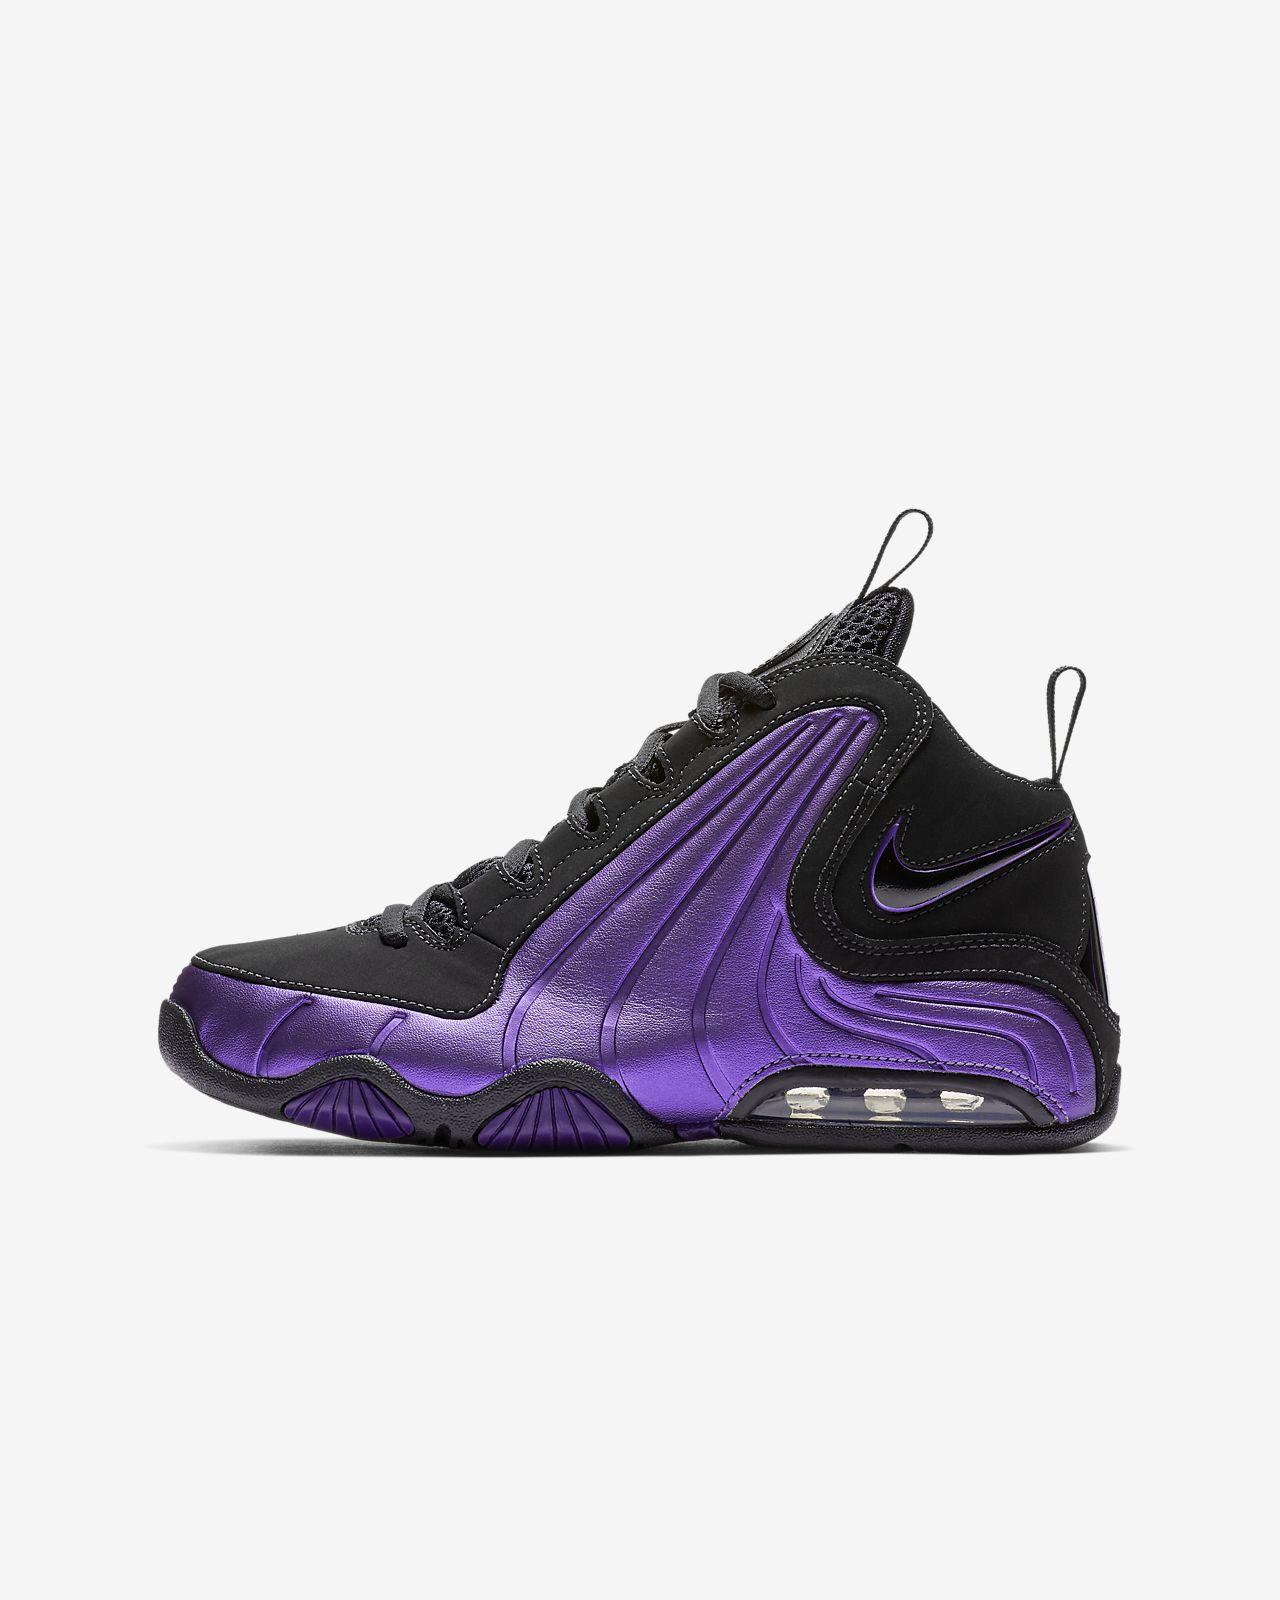 326771e983cc Nike Air Max Wavy Big Kids  Shoe. Nike.com